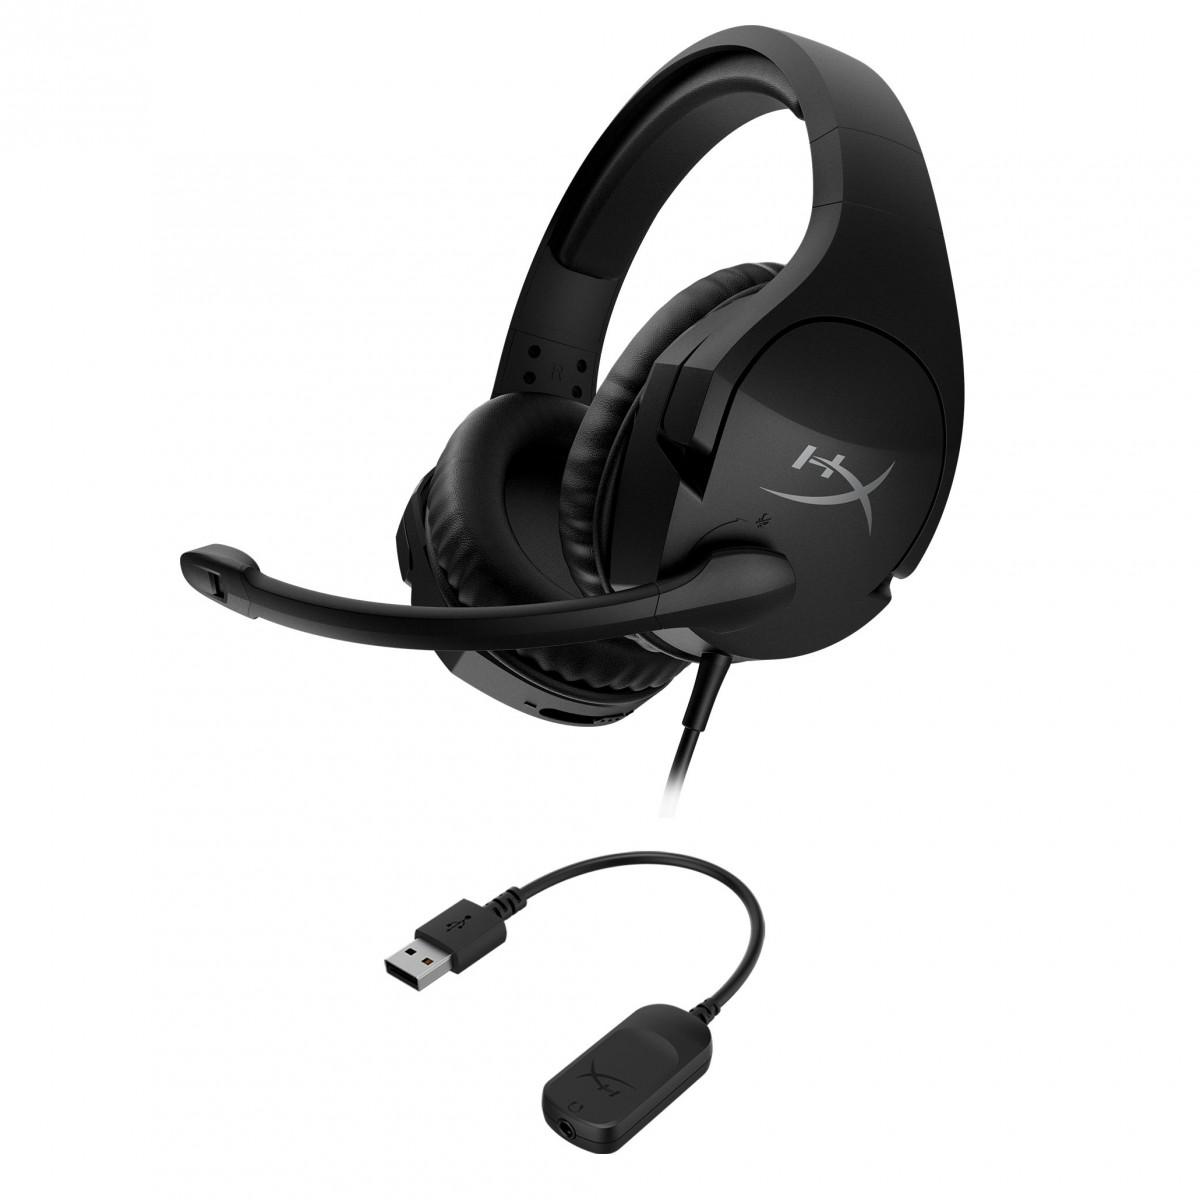 Headset Gamer HyperX Cloud Stinger S, 7.1 Surround, 3.5mm ou USB, 50mm, Black, HSS1S-AA-BK/G